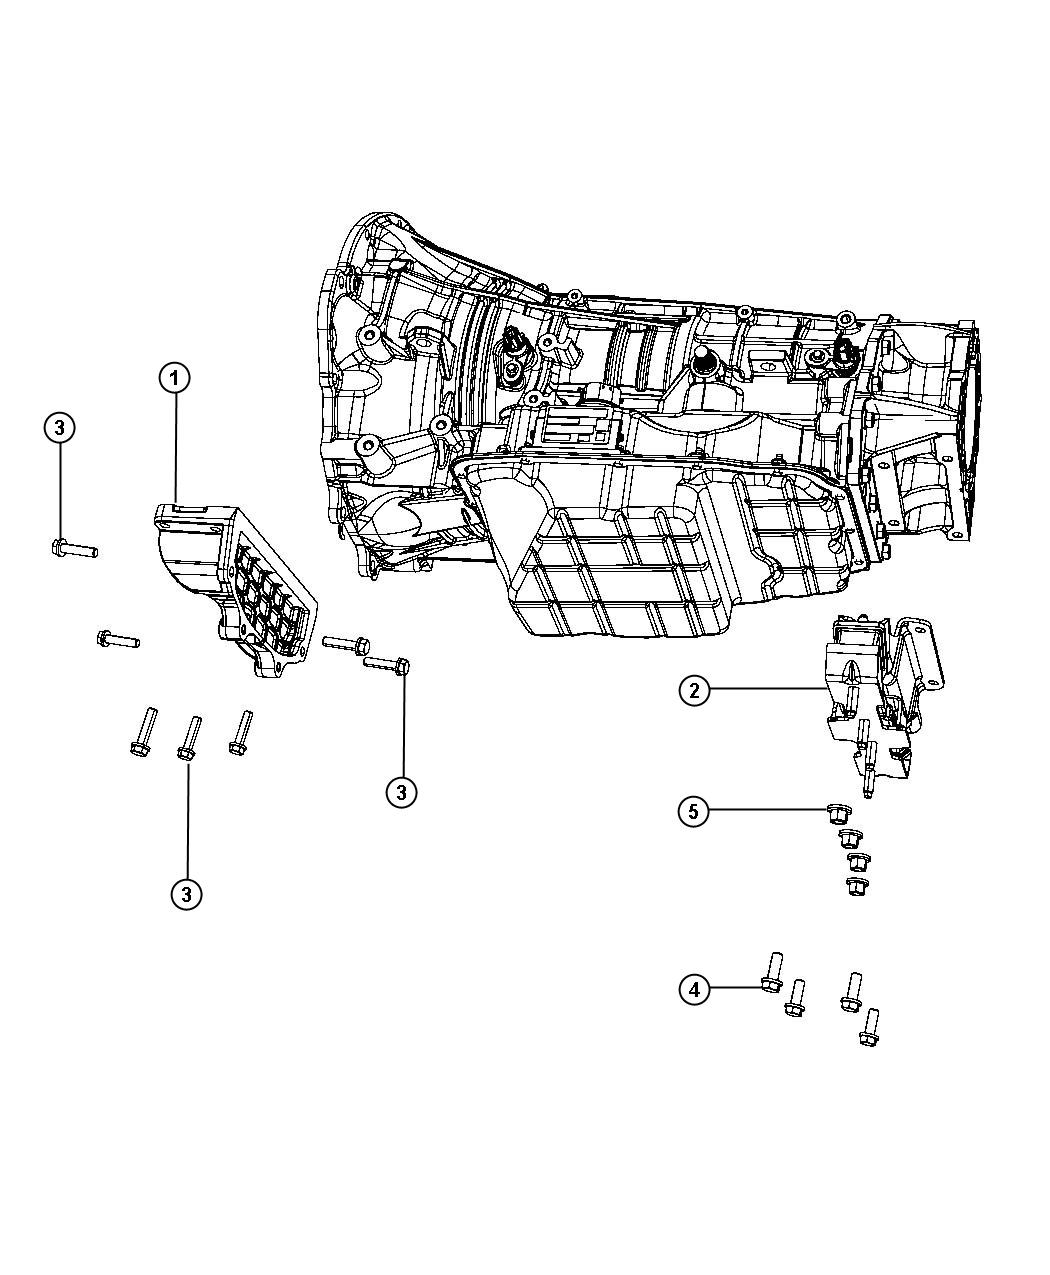 2012 Dodge Ram 1500 Bracket. Transmission mount. Body 61